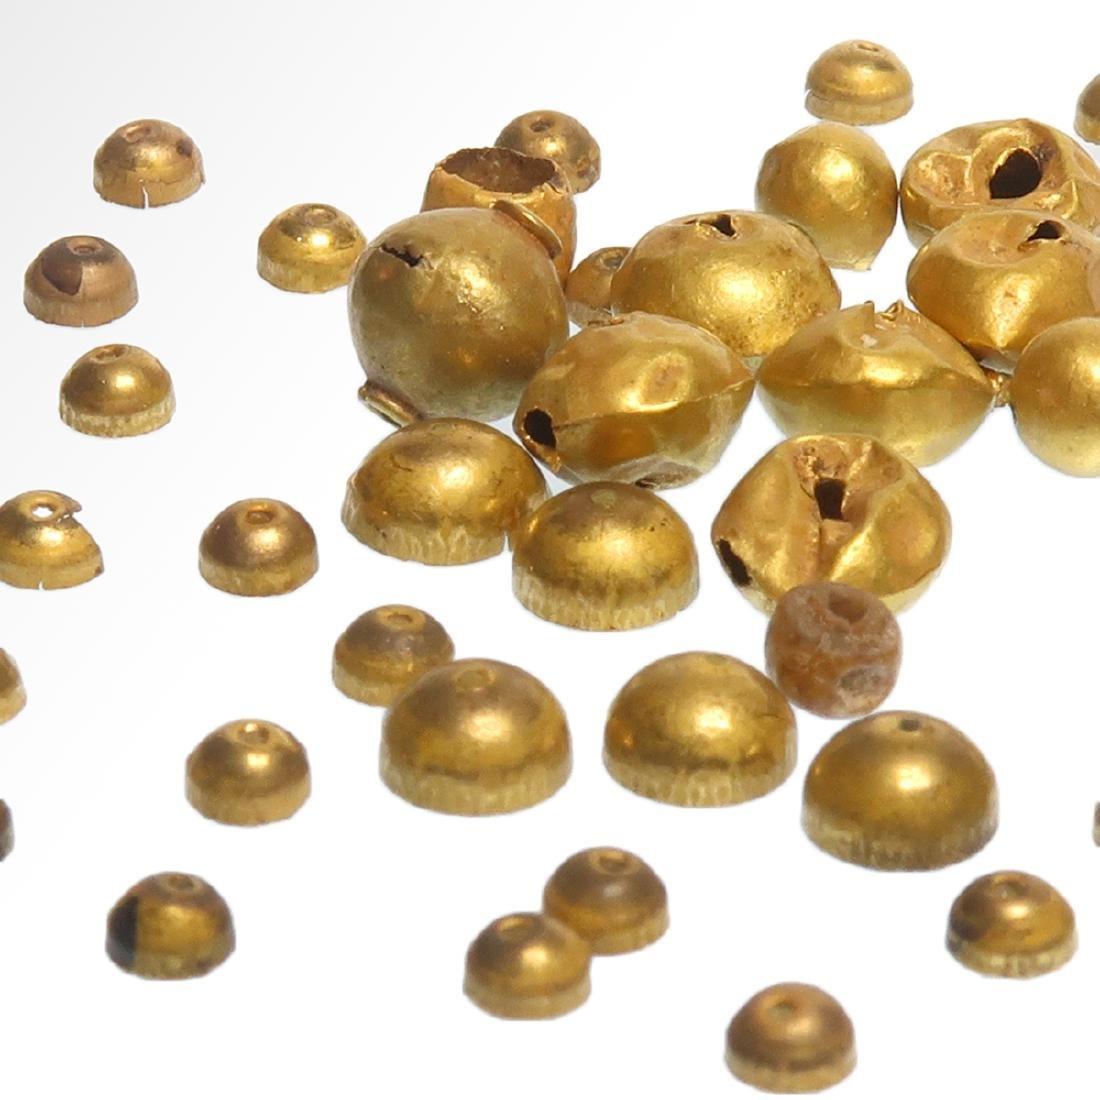 Forty-nine Roman Gold Beads, c. 1st Century A.D. - 2